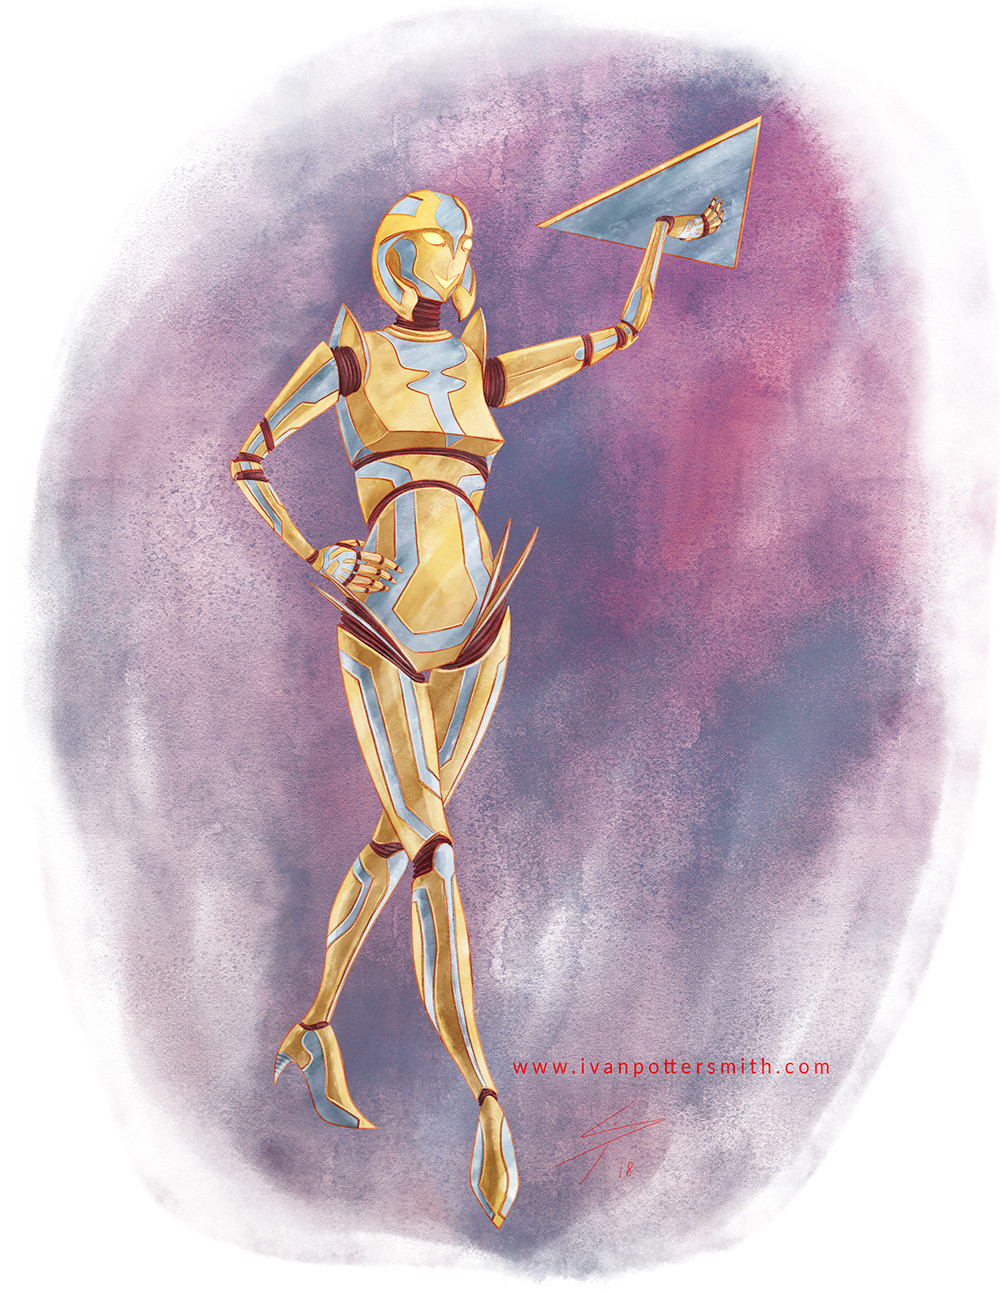 Nebula - Trinity - Página 3 Ivan-potter-smith-robot-web